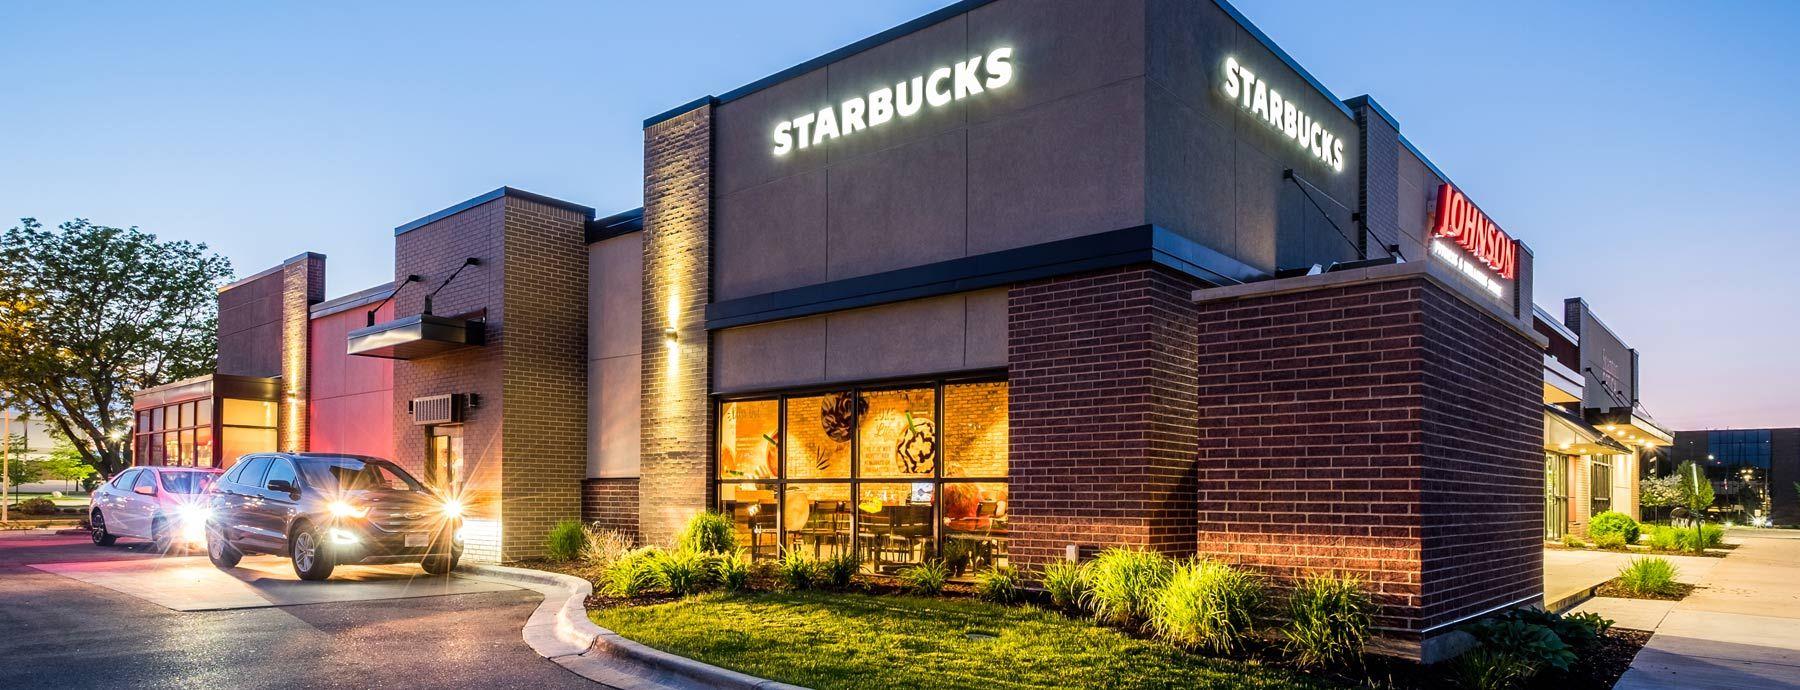 434 Gammon Place - Starbucks